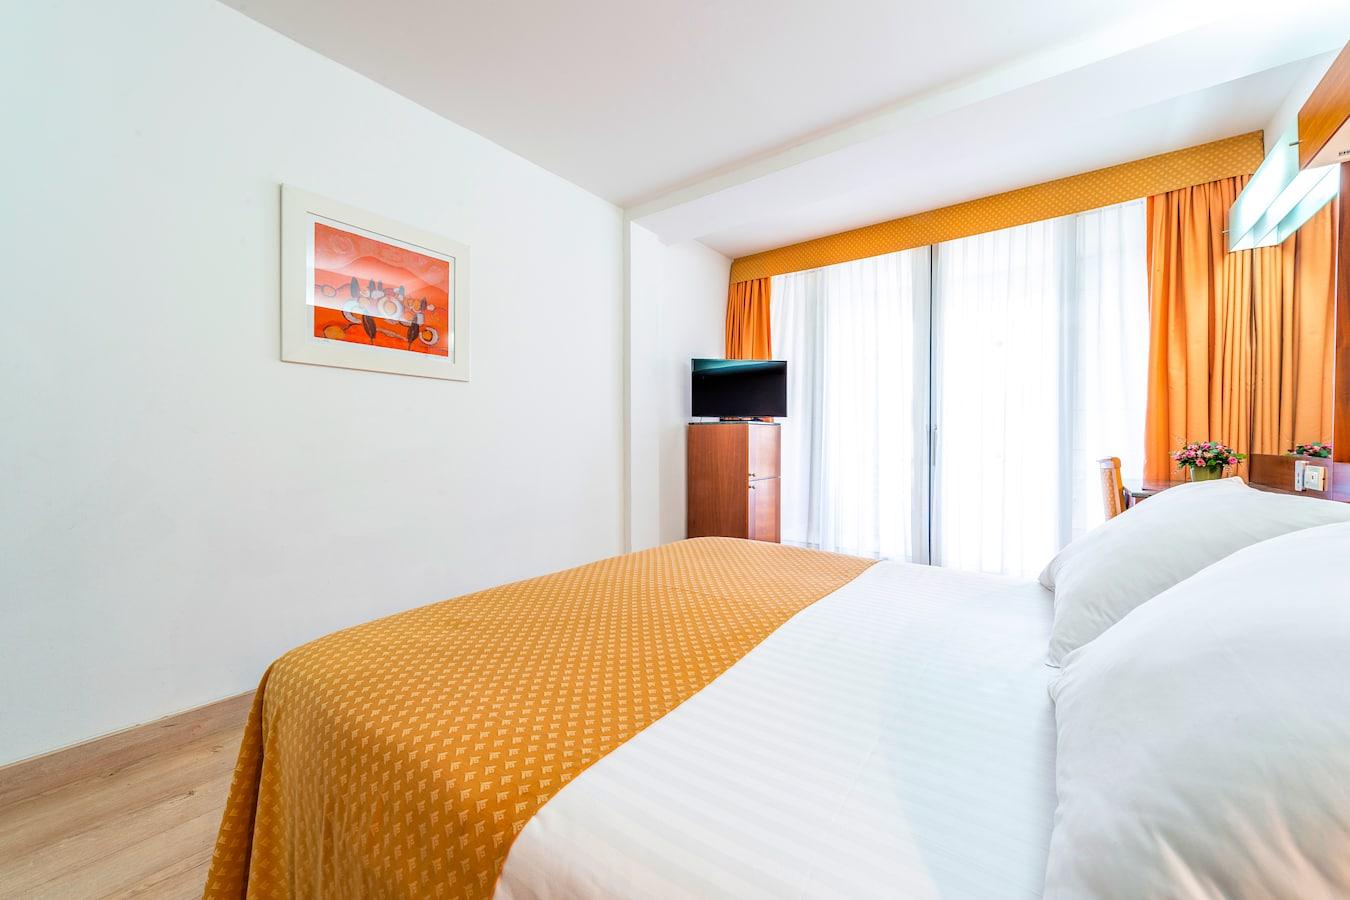 uvala-hotel-double-room-dubrovnik.jpg